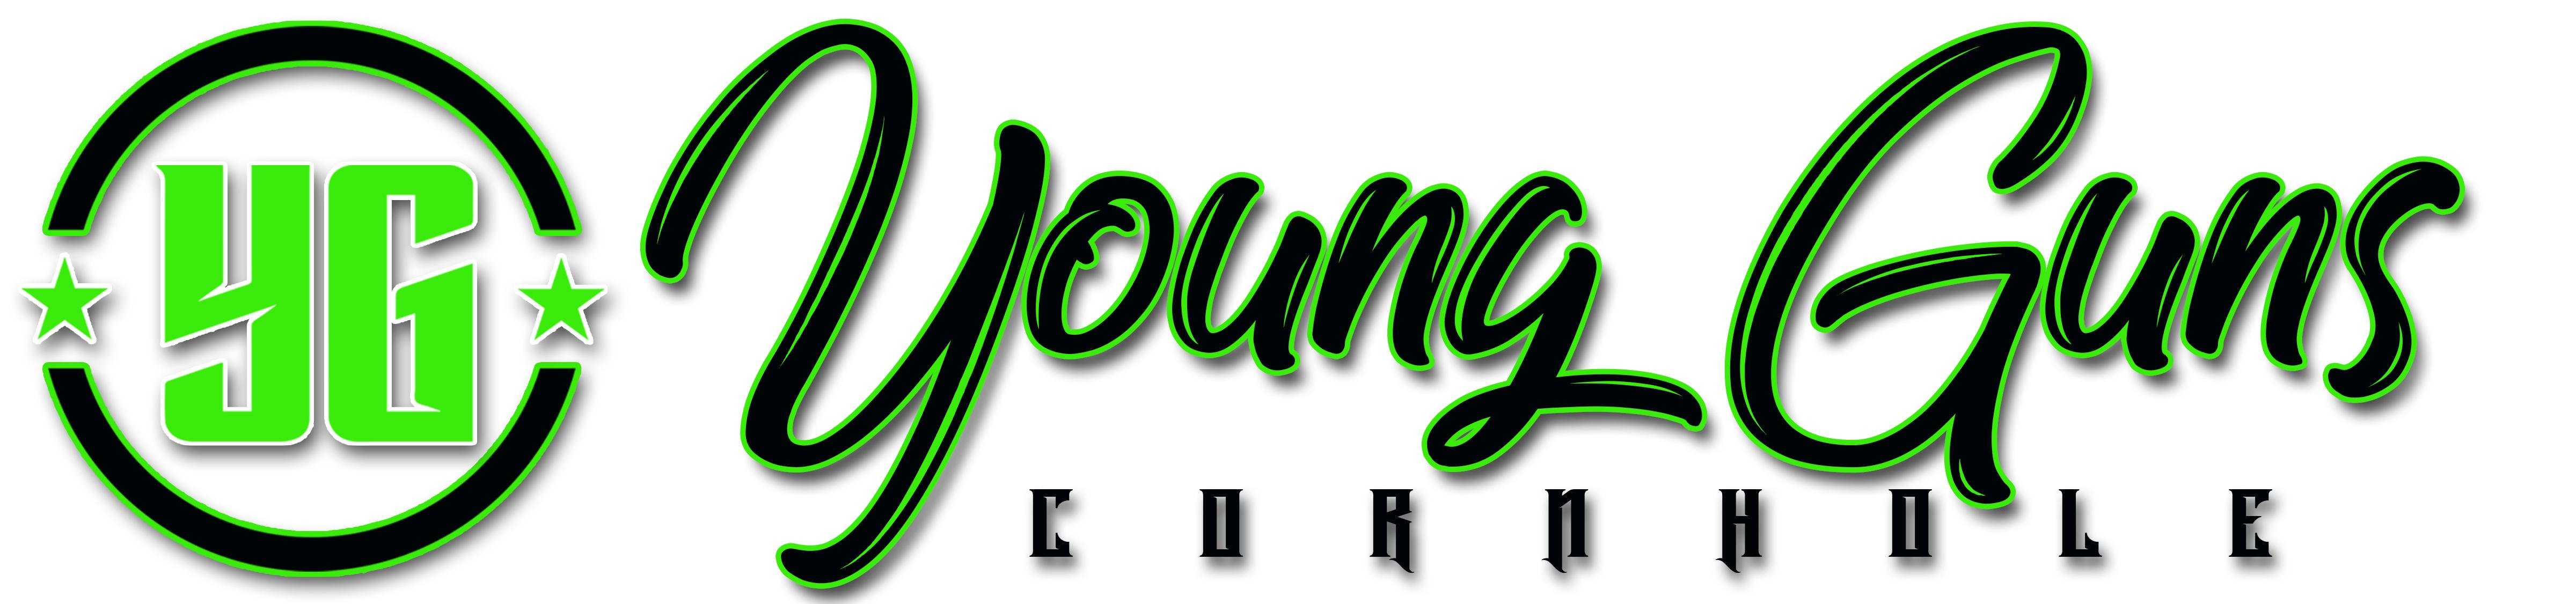 Young Guns Cornhole